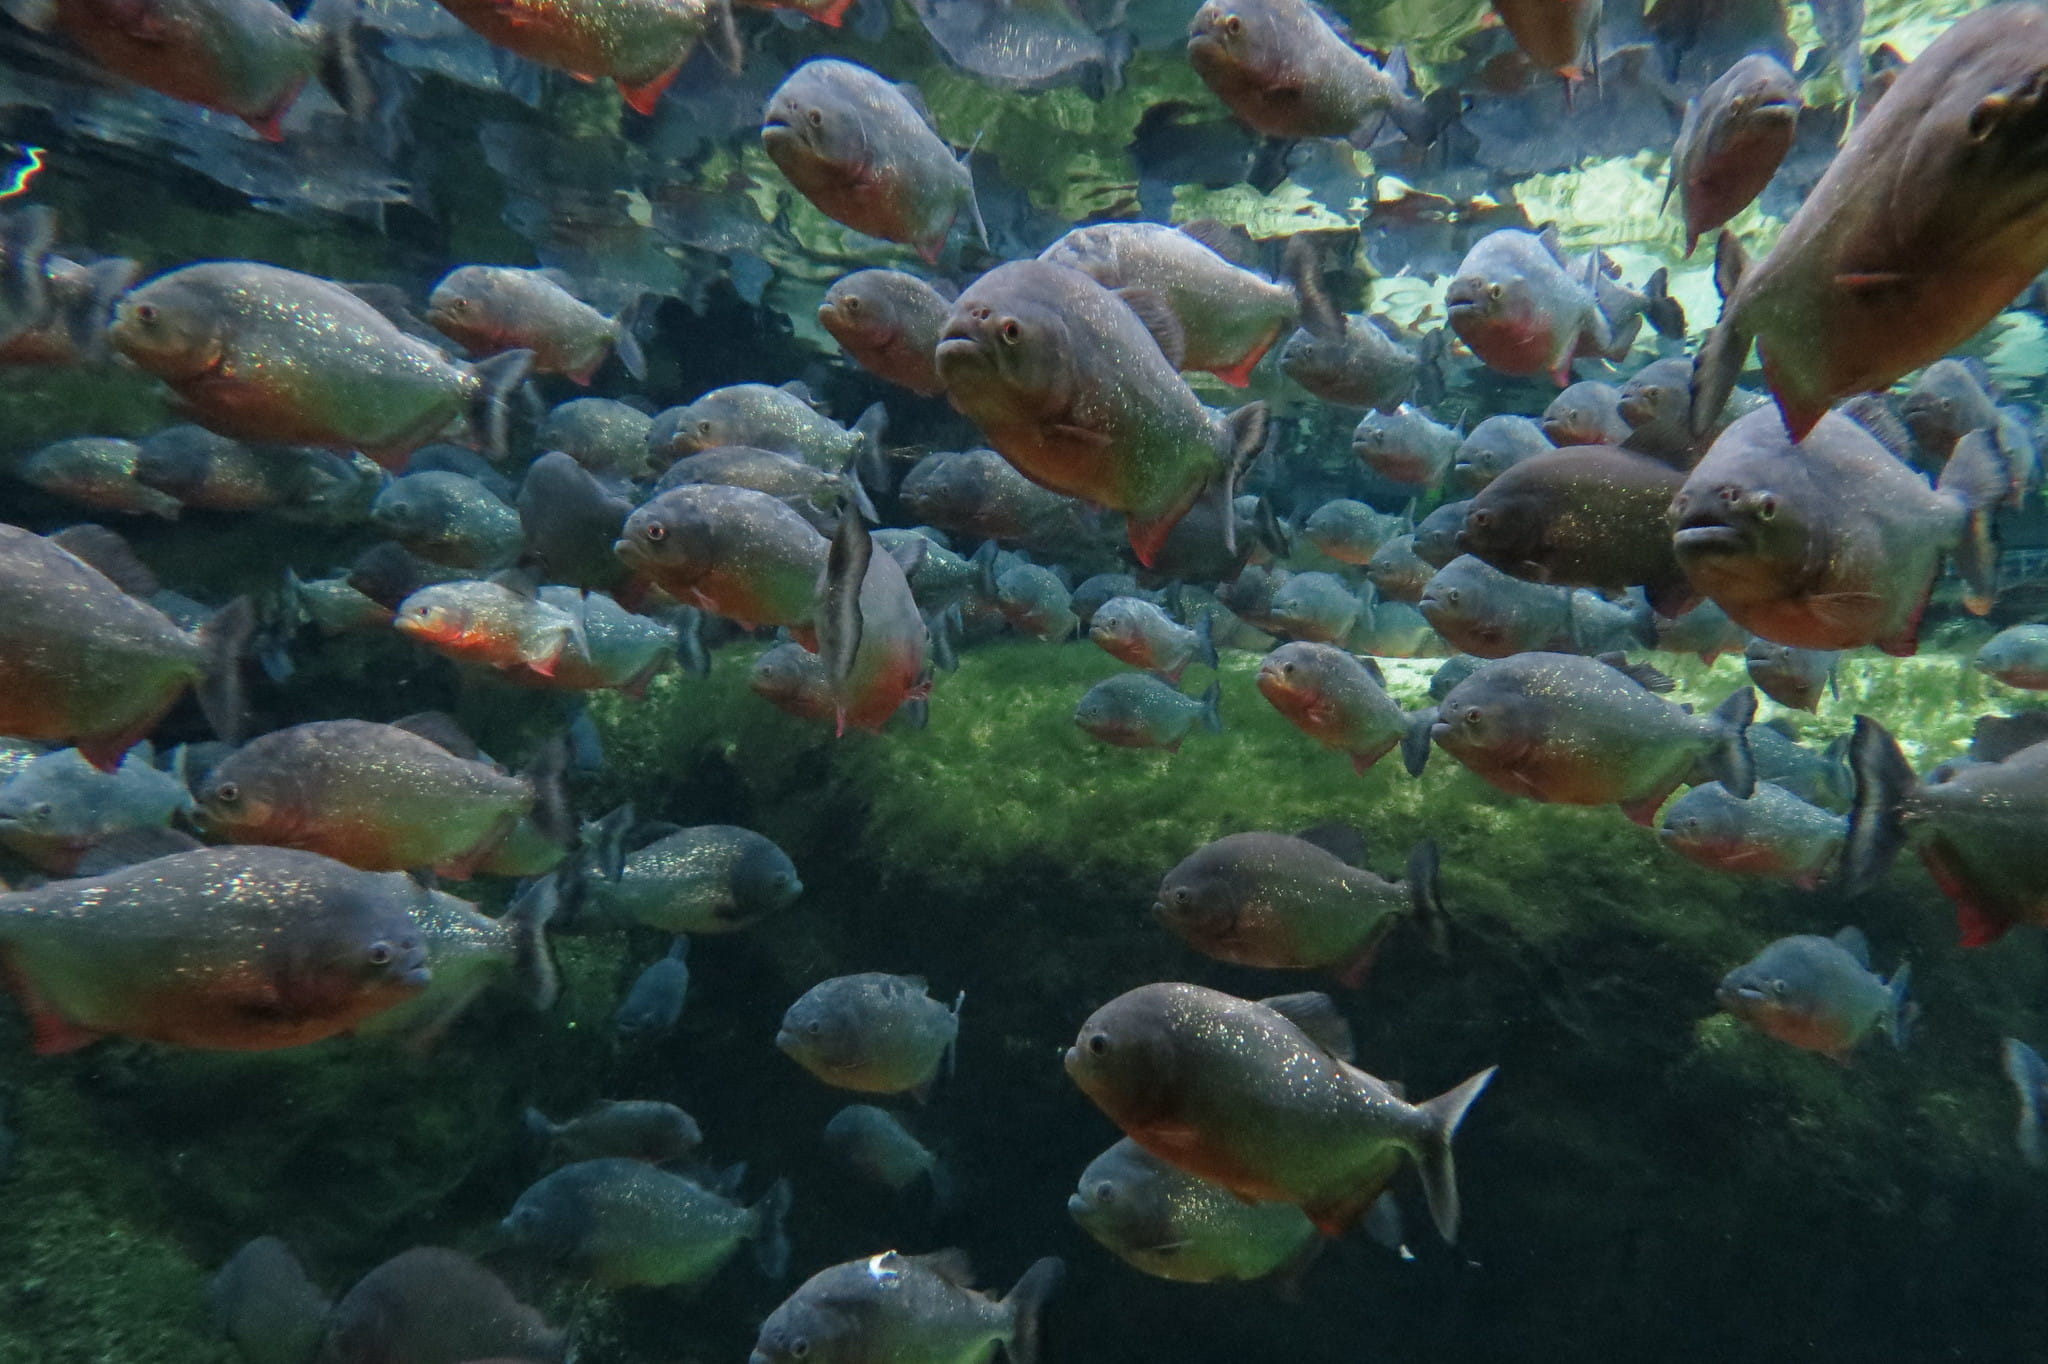 Os peixes mais surpreendentes do Brasil - Parte I